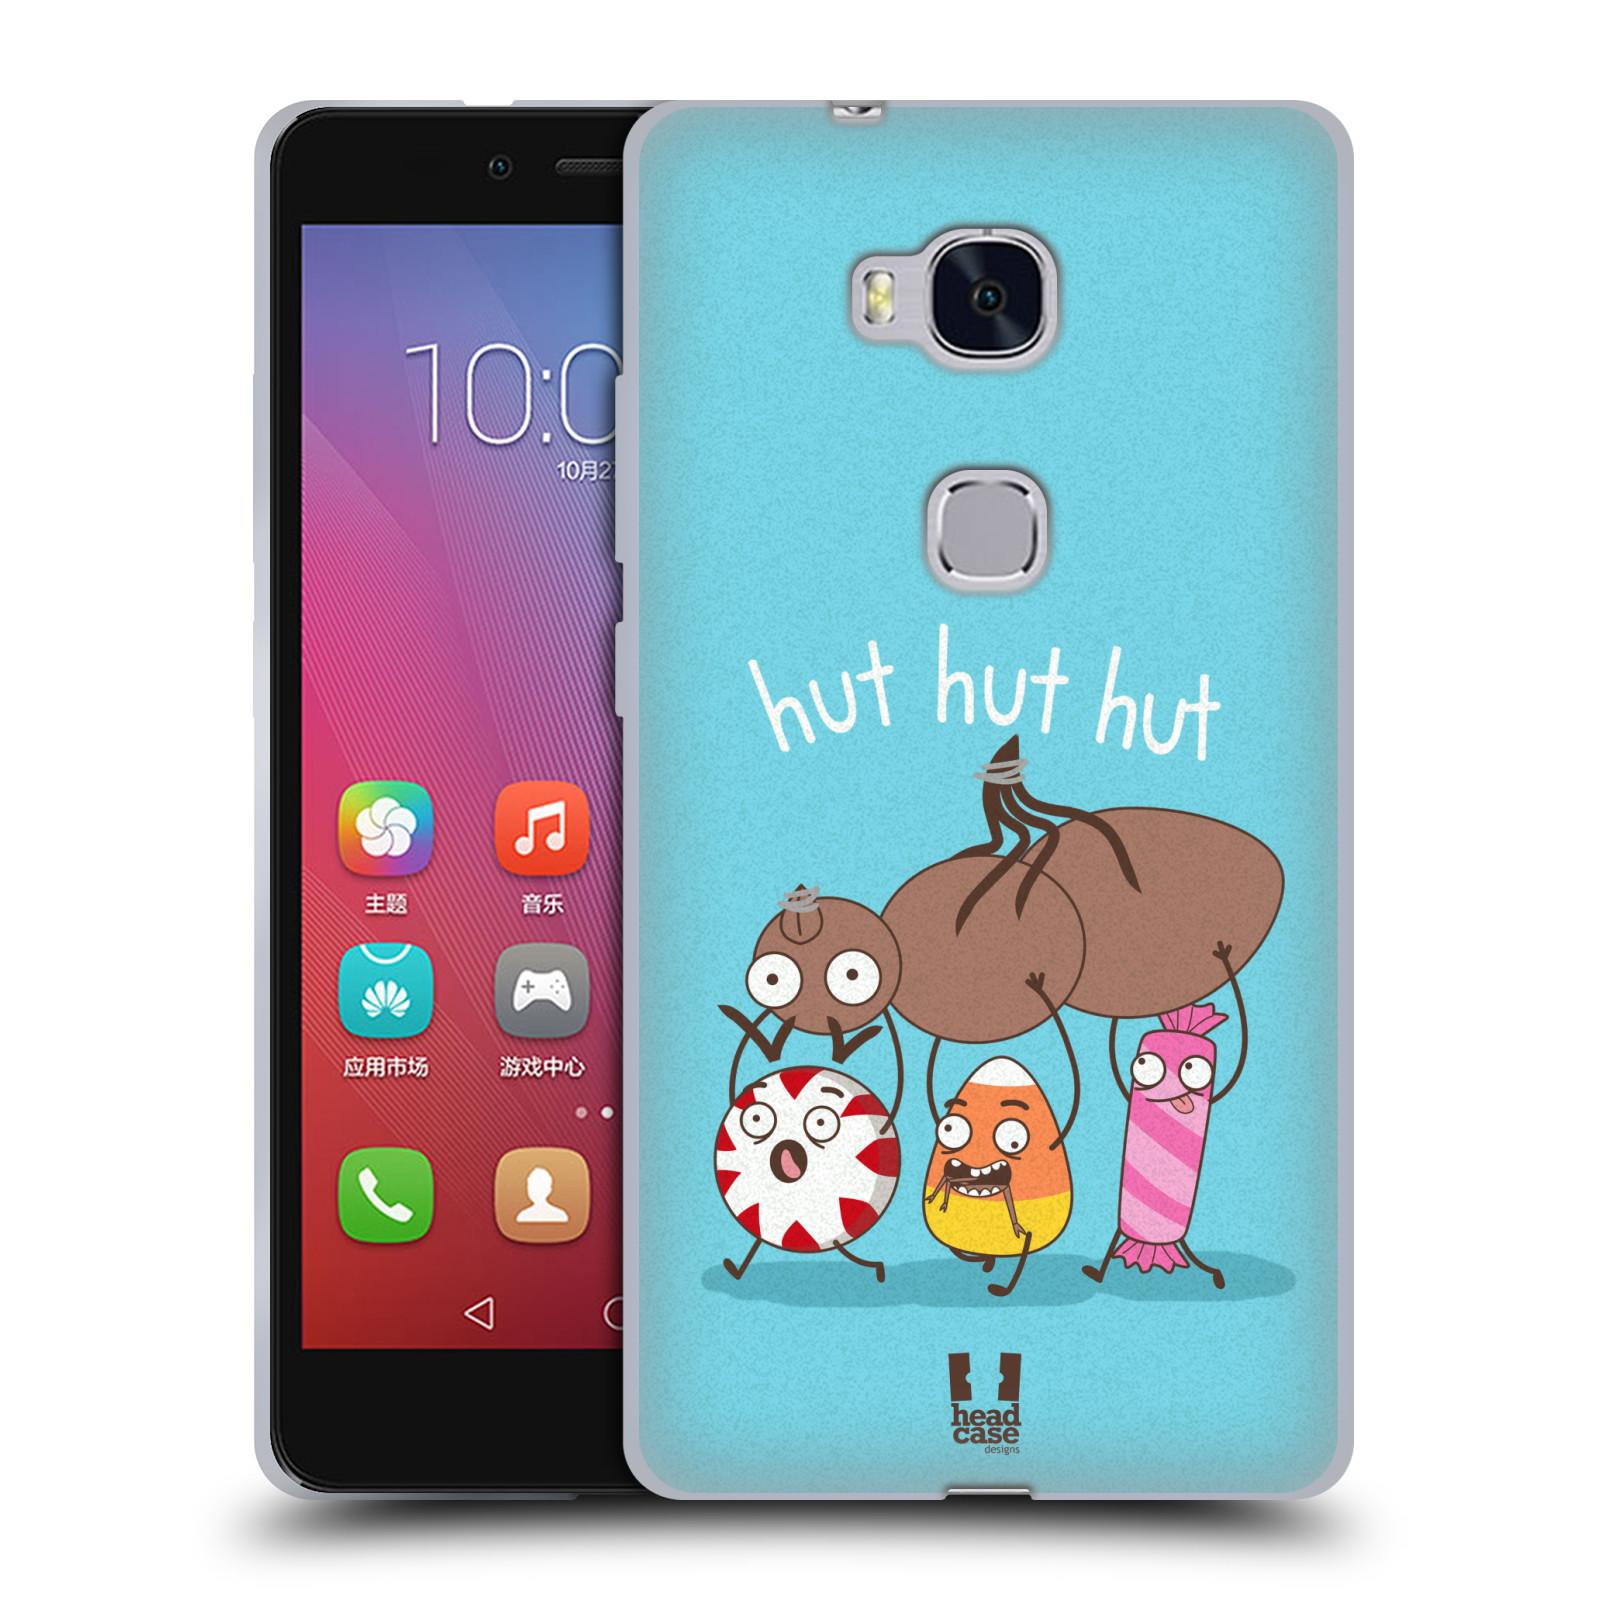 Silikonové pouzdro na mobil Honor 5X HEAD CASE DEN NARUBY MRAVENCI ad7fa9f4cd5